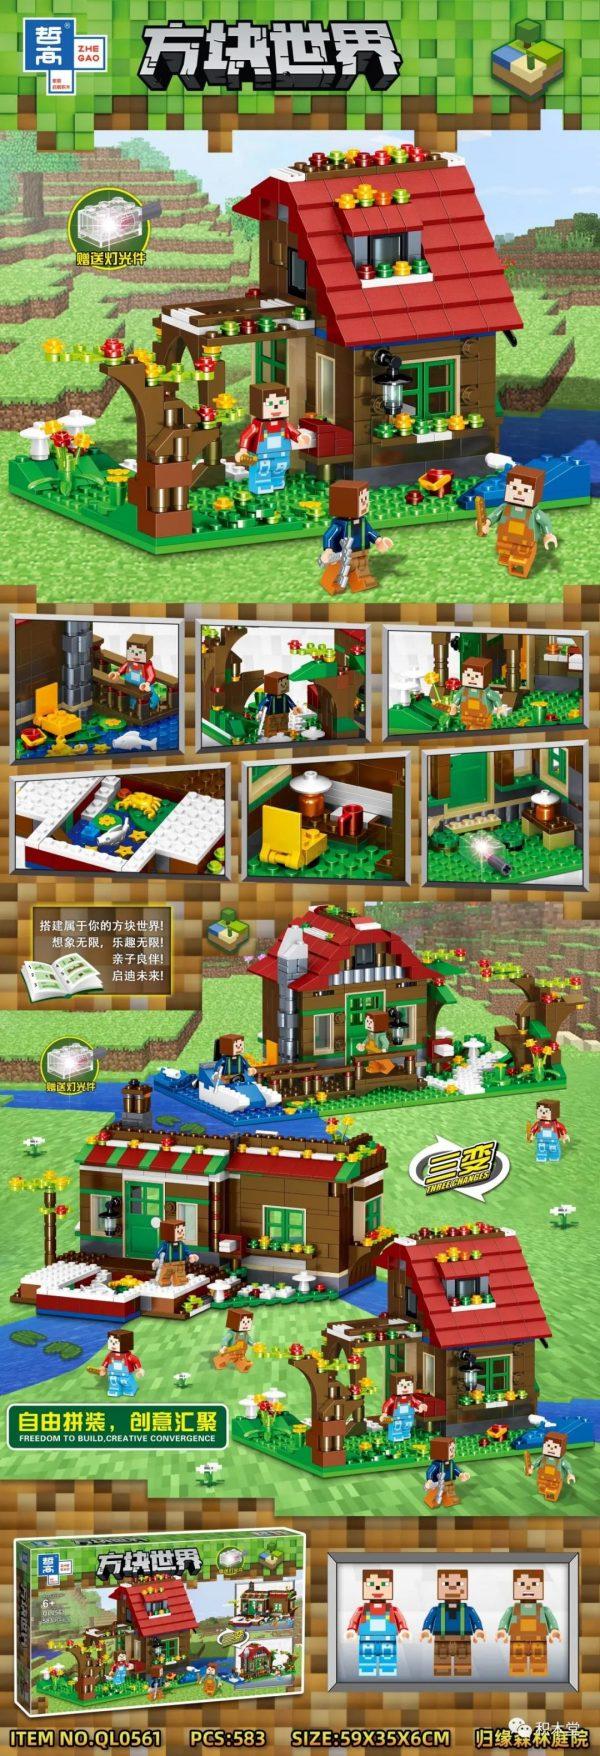 ZHEGAO QL0227 Block World: Home Forest Courtyard 0